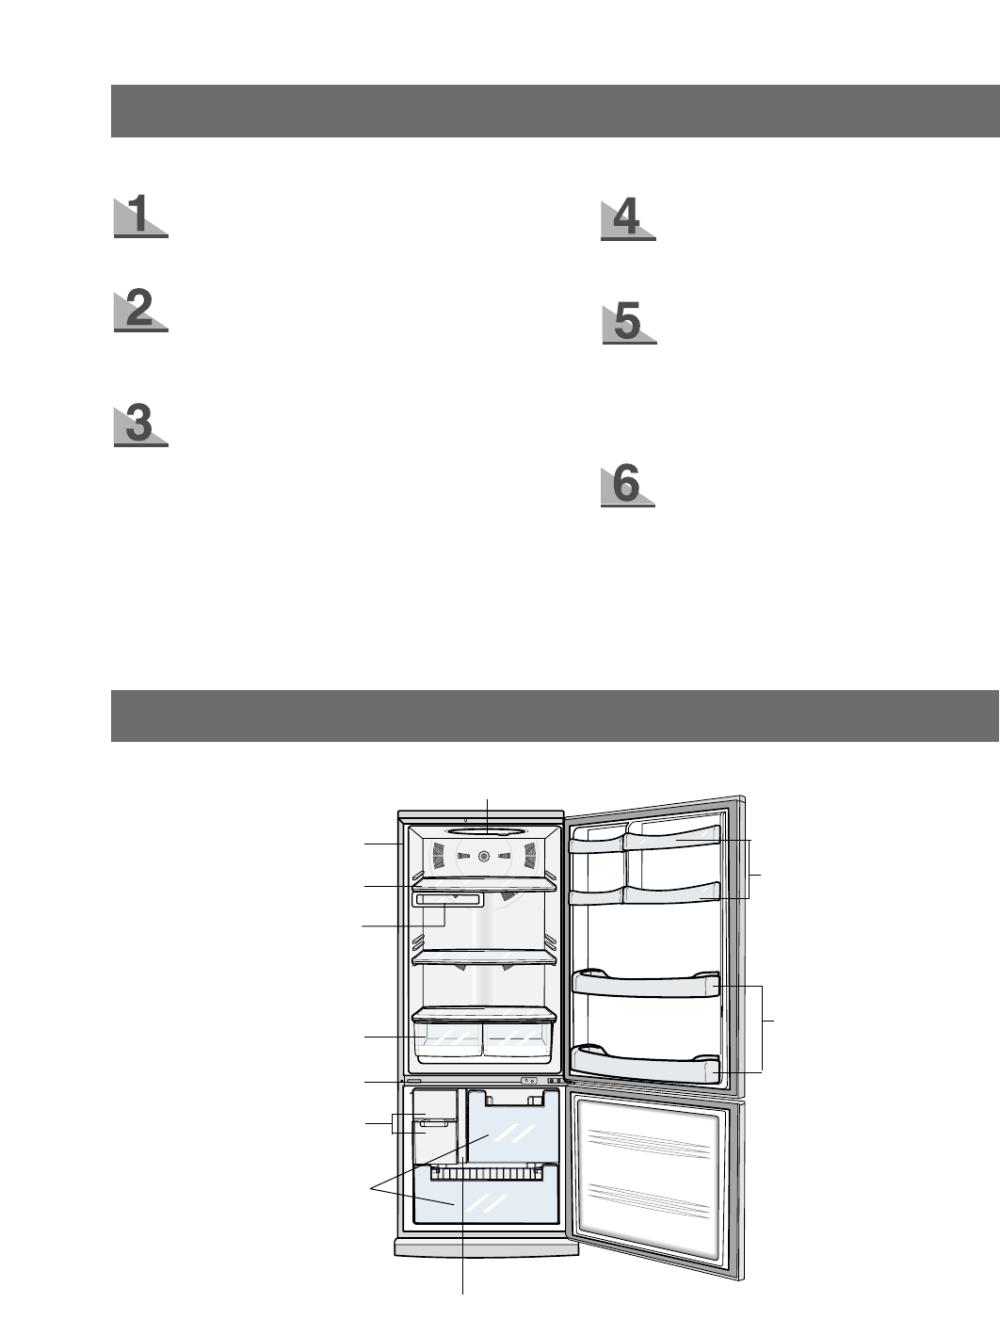 medium resolution of samsung rb215lash wiring schematic wiring diagram technic samsung refrigerator rb215labp wiring diagram